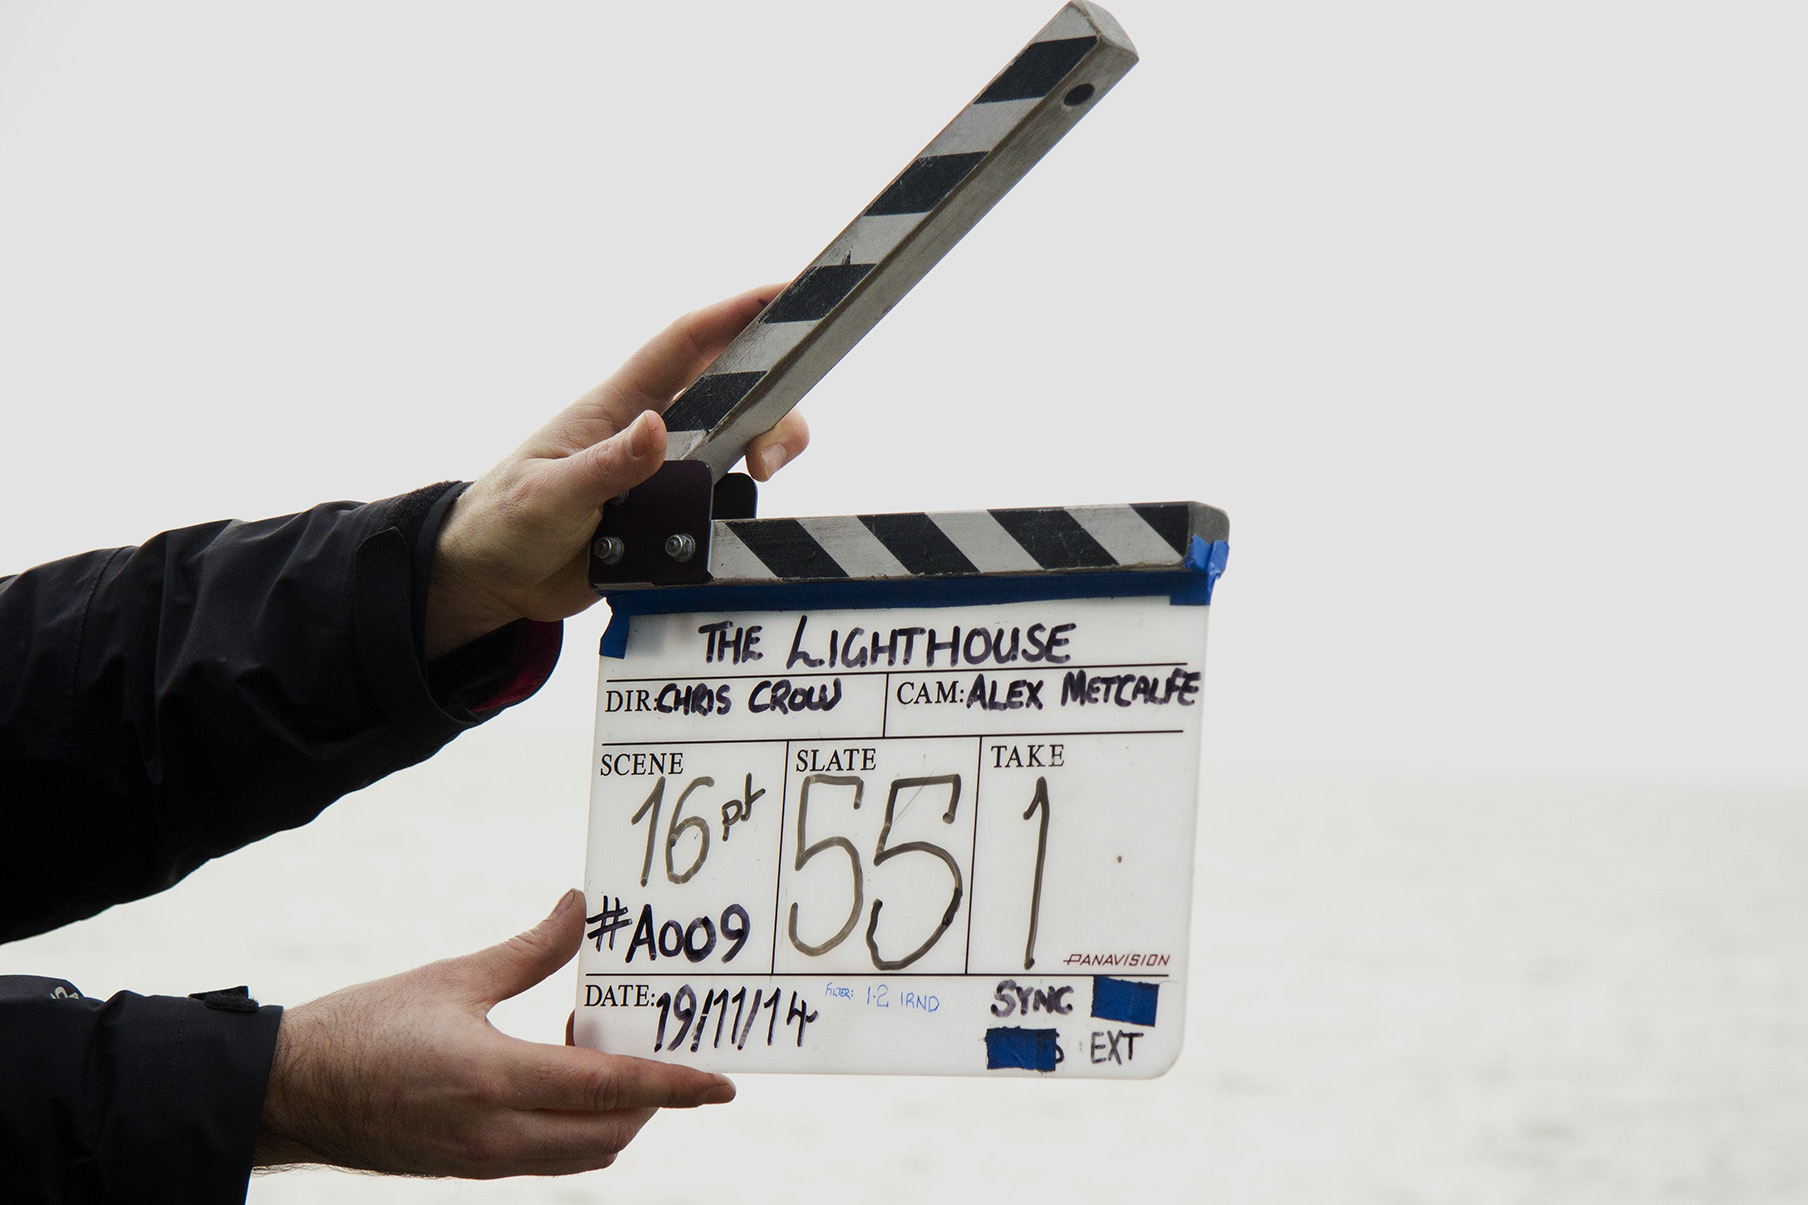 Slate (The Lighthouse)